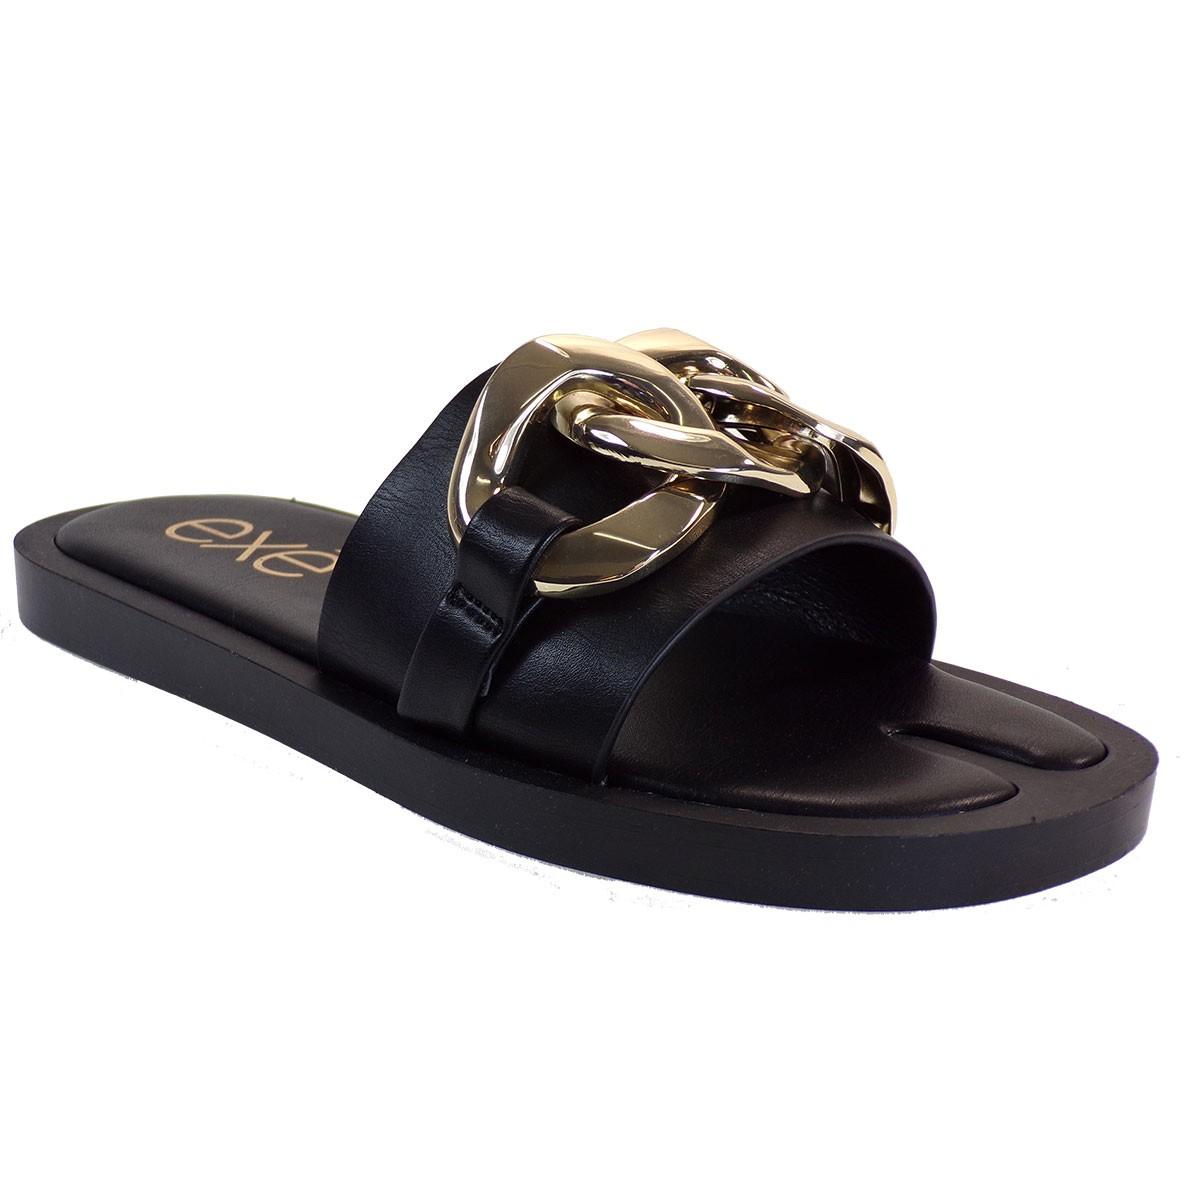 EXE Shoes Γυναικείες Παντόφλες SAMANTHA-273 Μαύρο M47002732001